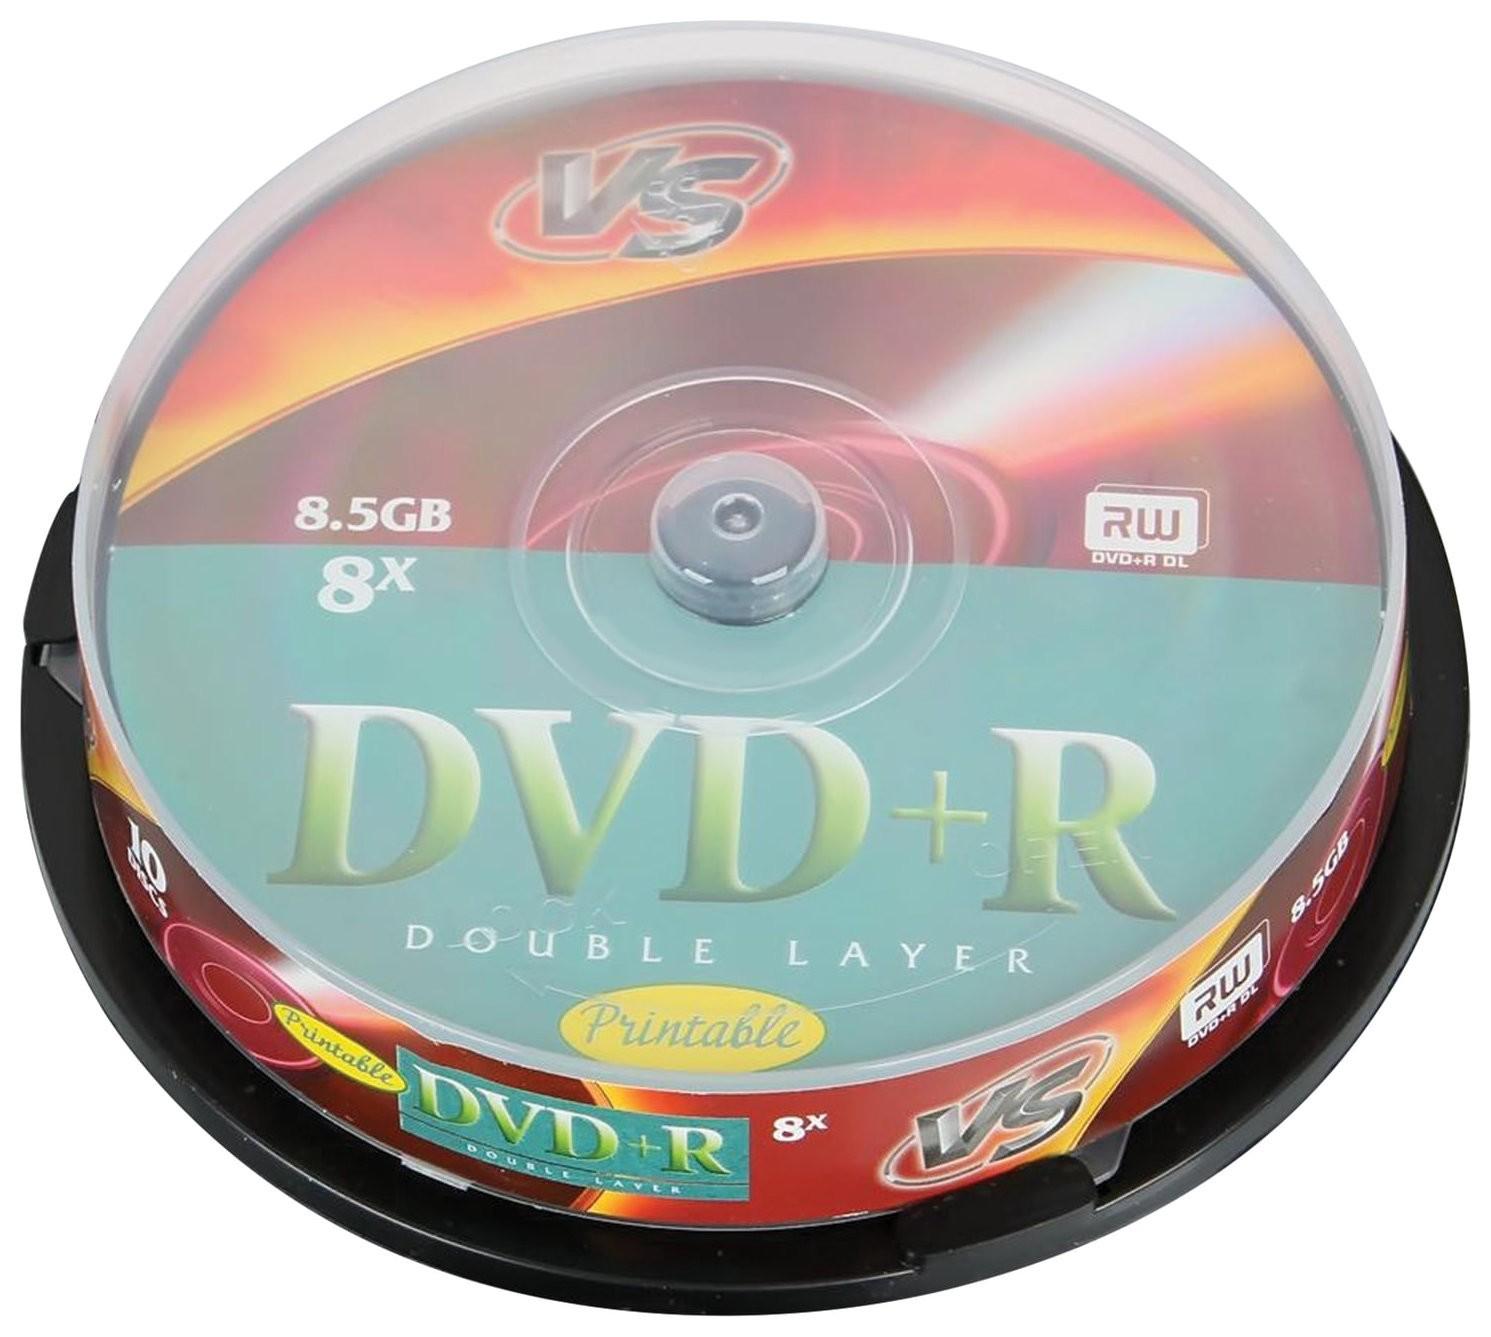 Диски Dvd+r Vs 8,5 Gb 8x, комплект 10 шт., Cake Box, двухслойный  Vs